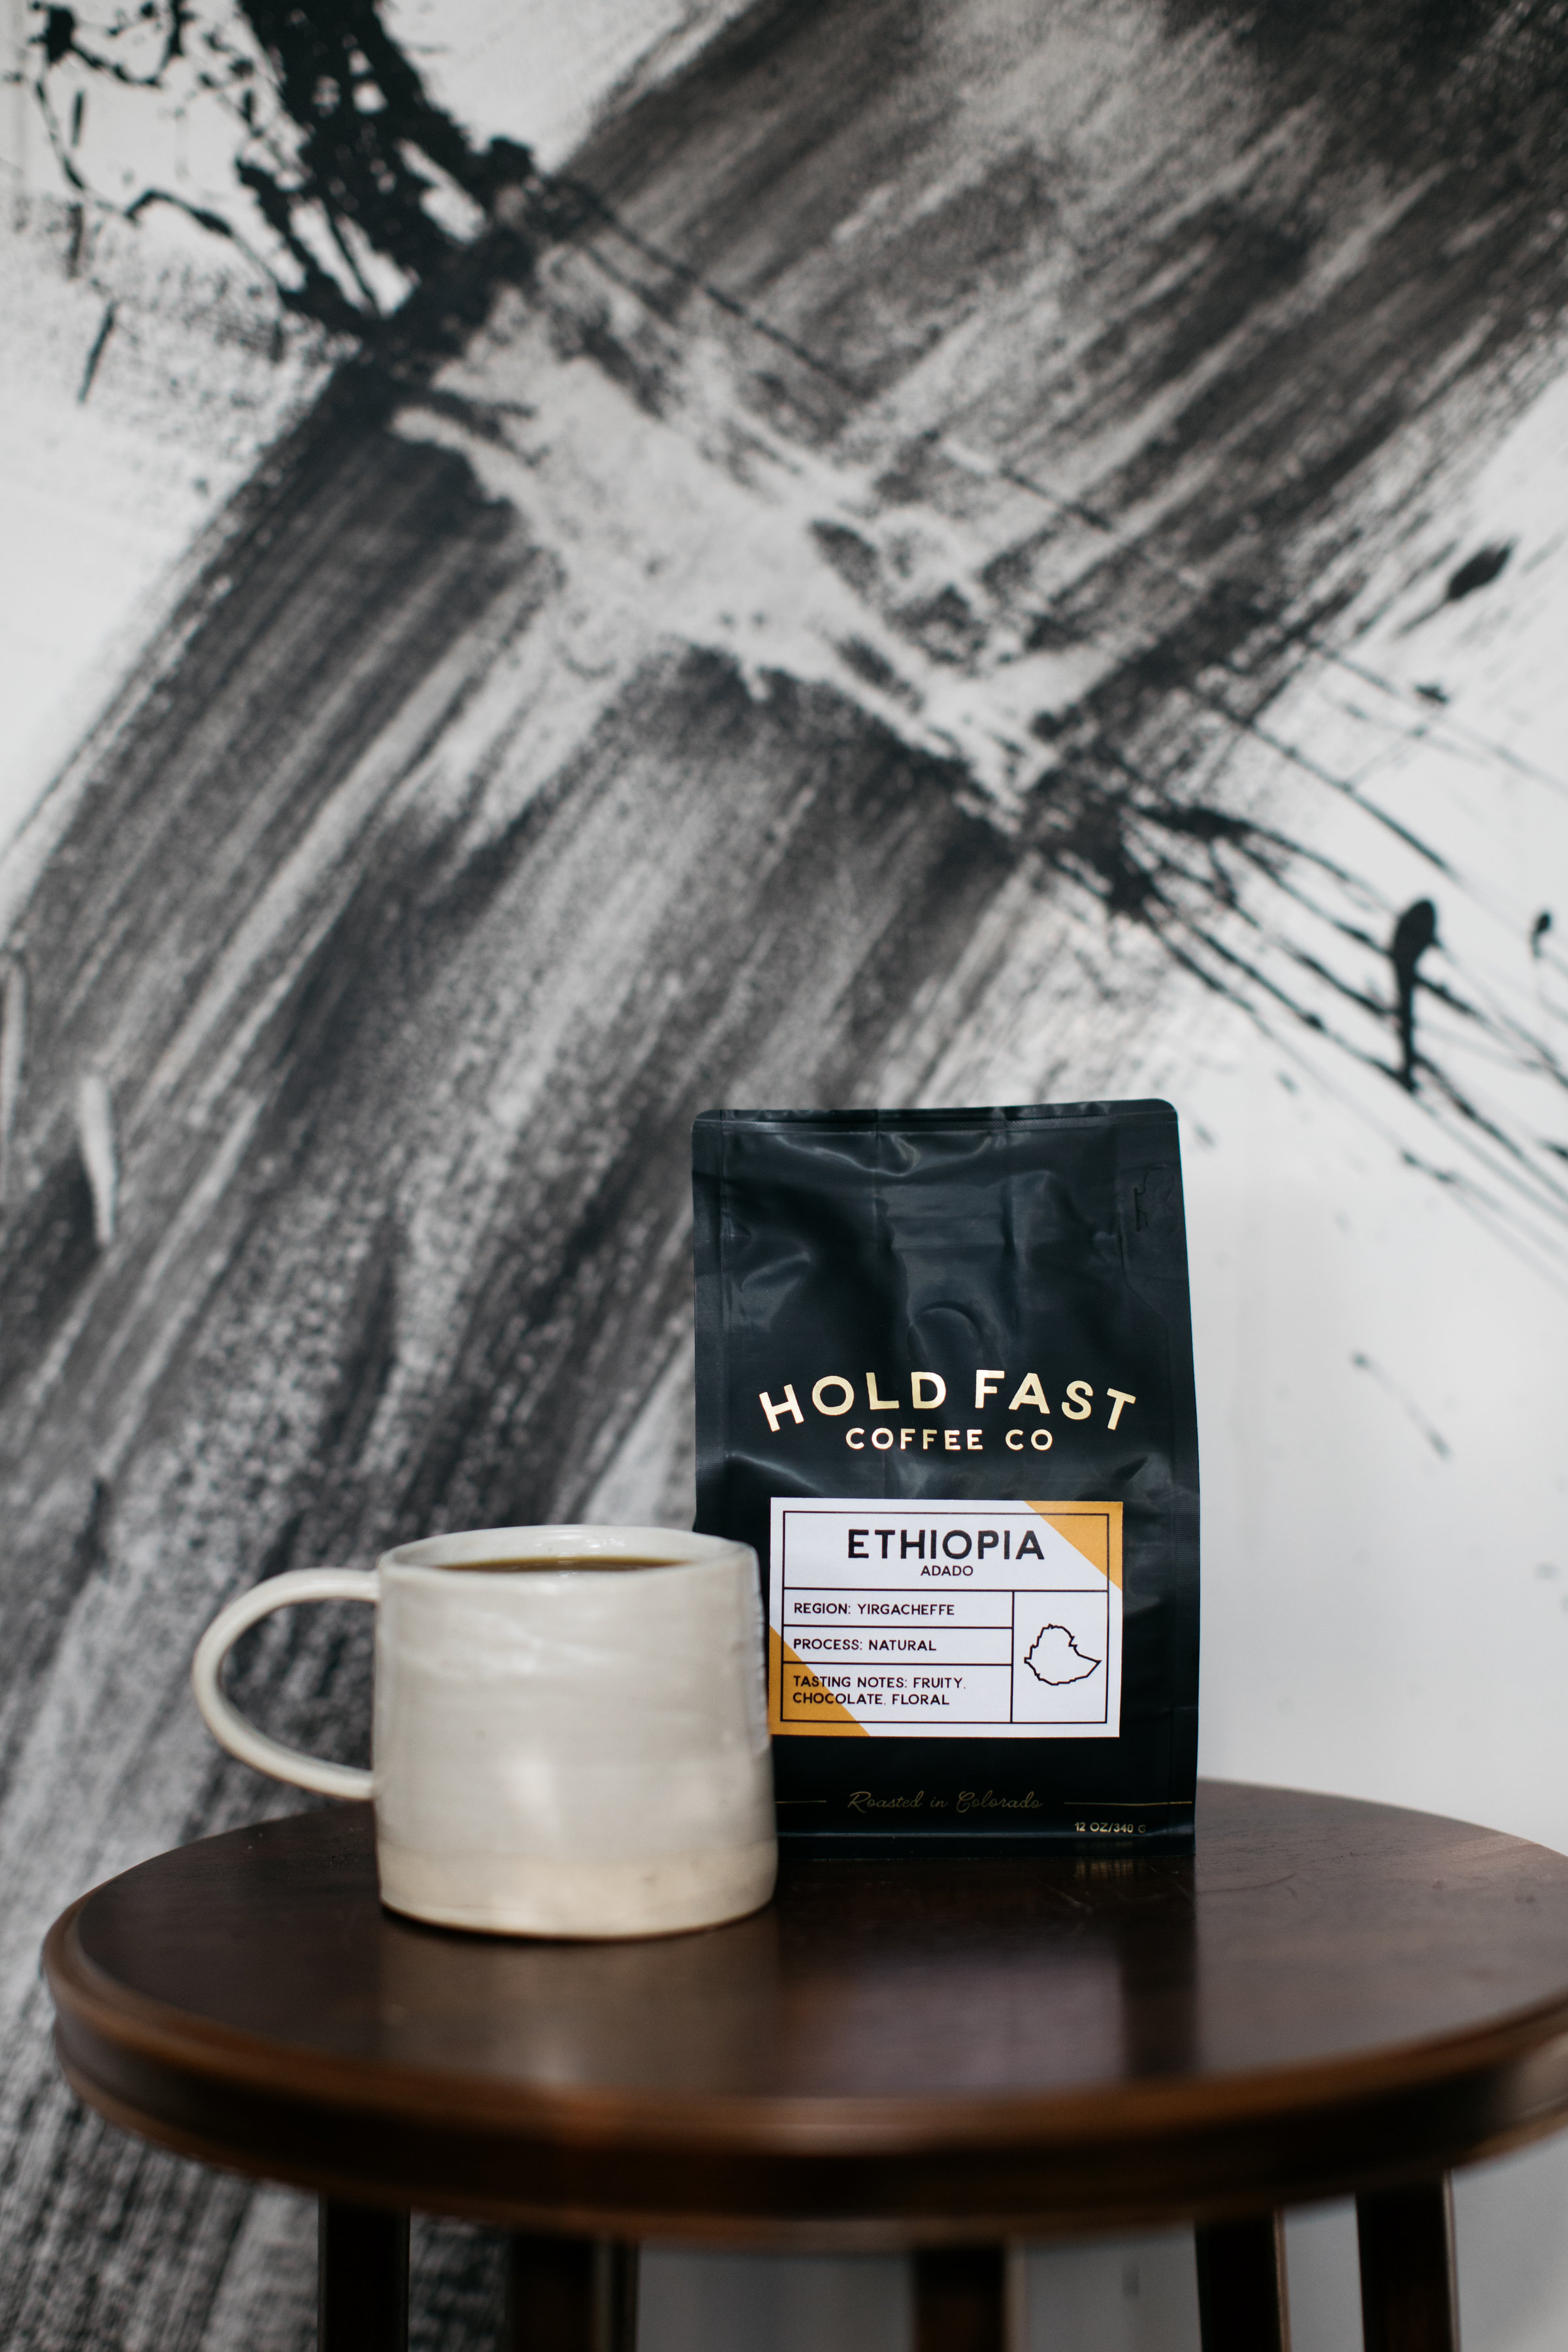 Hold-Fast-Coffee-Colorado-Springs-9.jpg